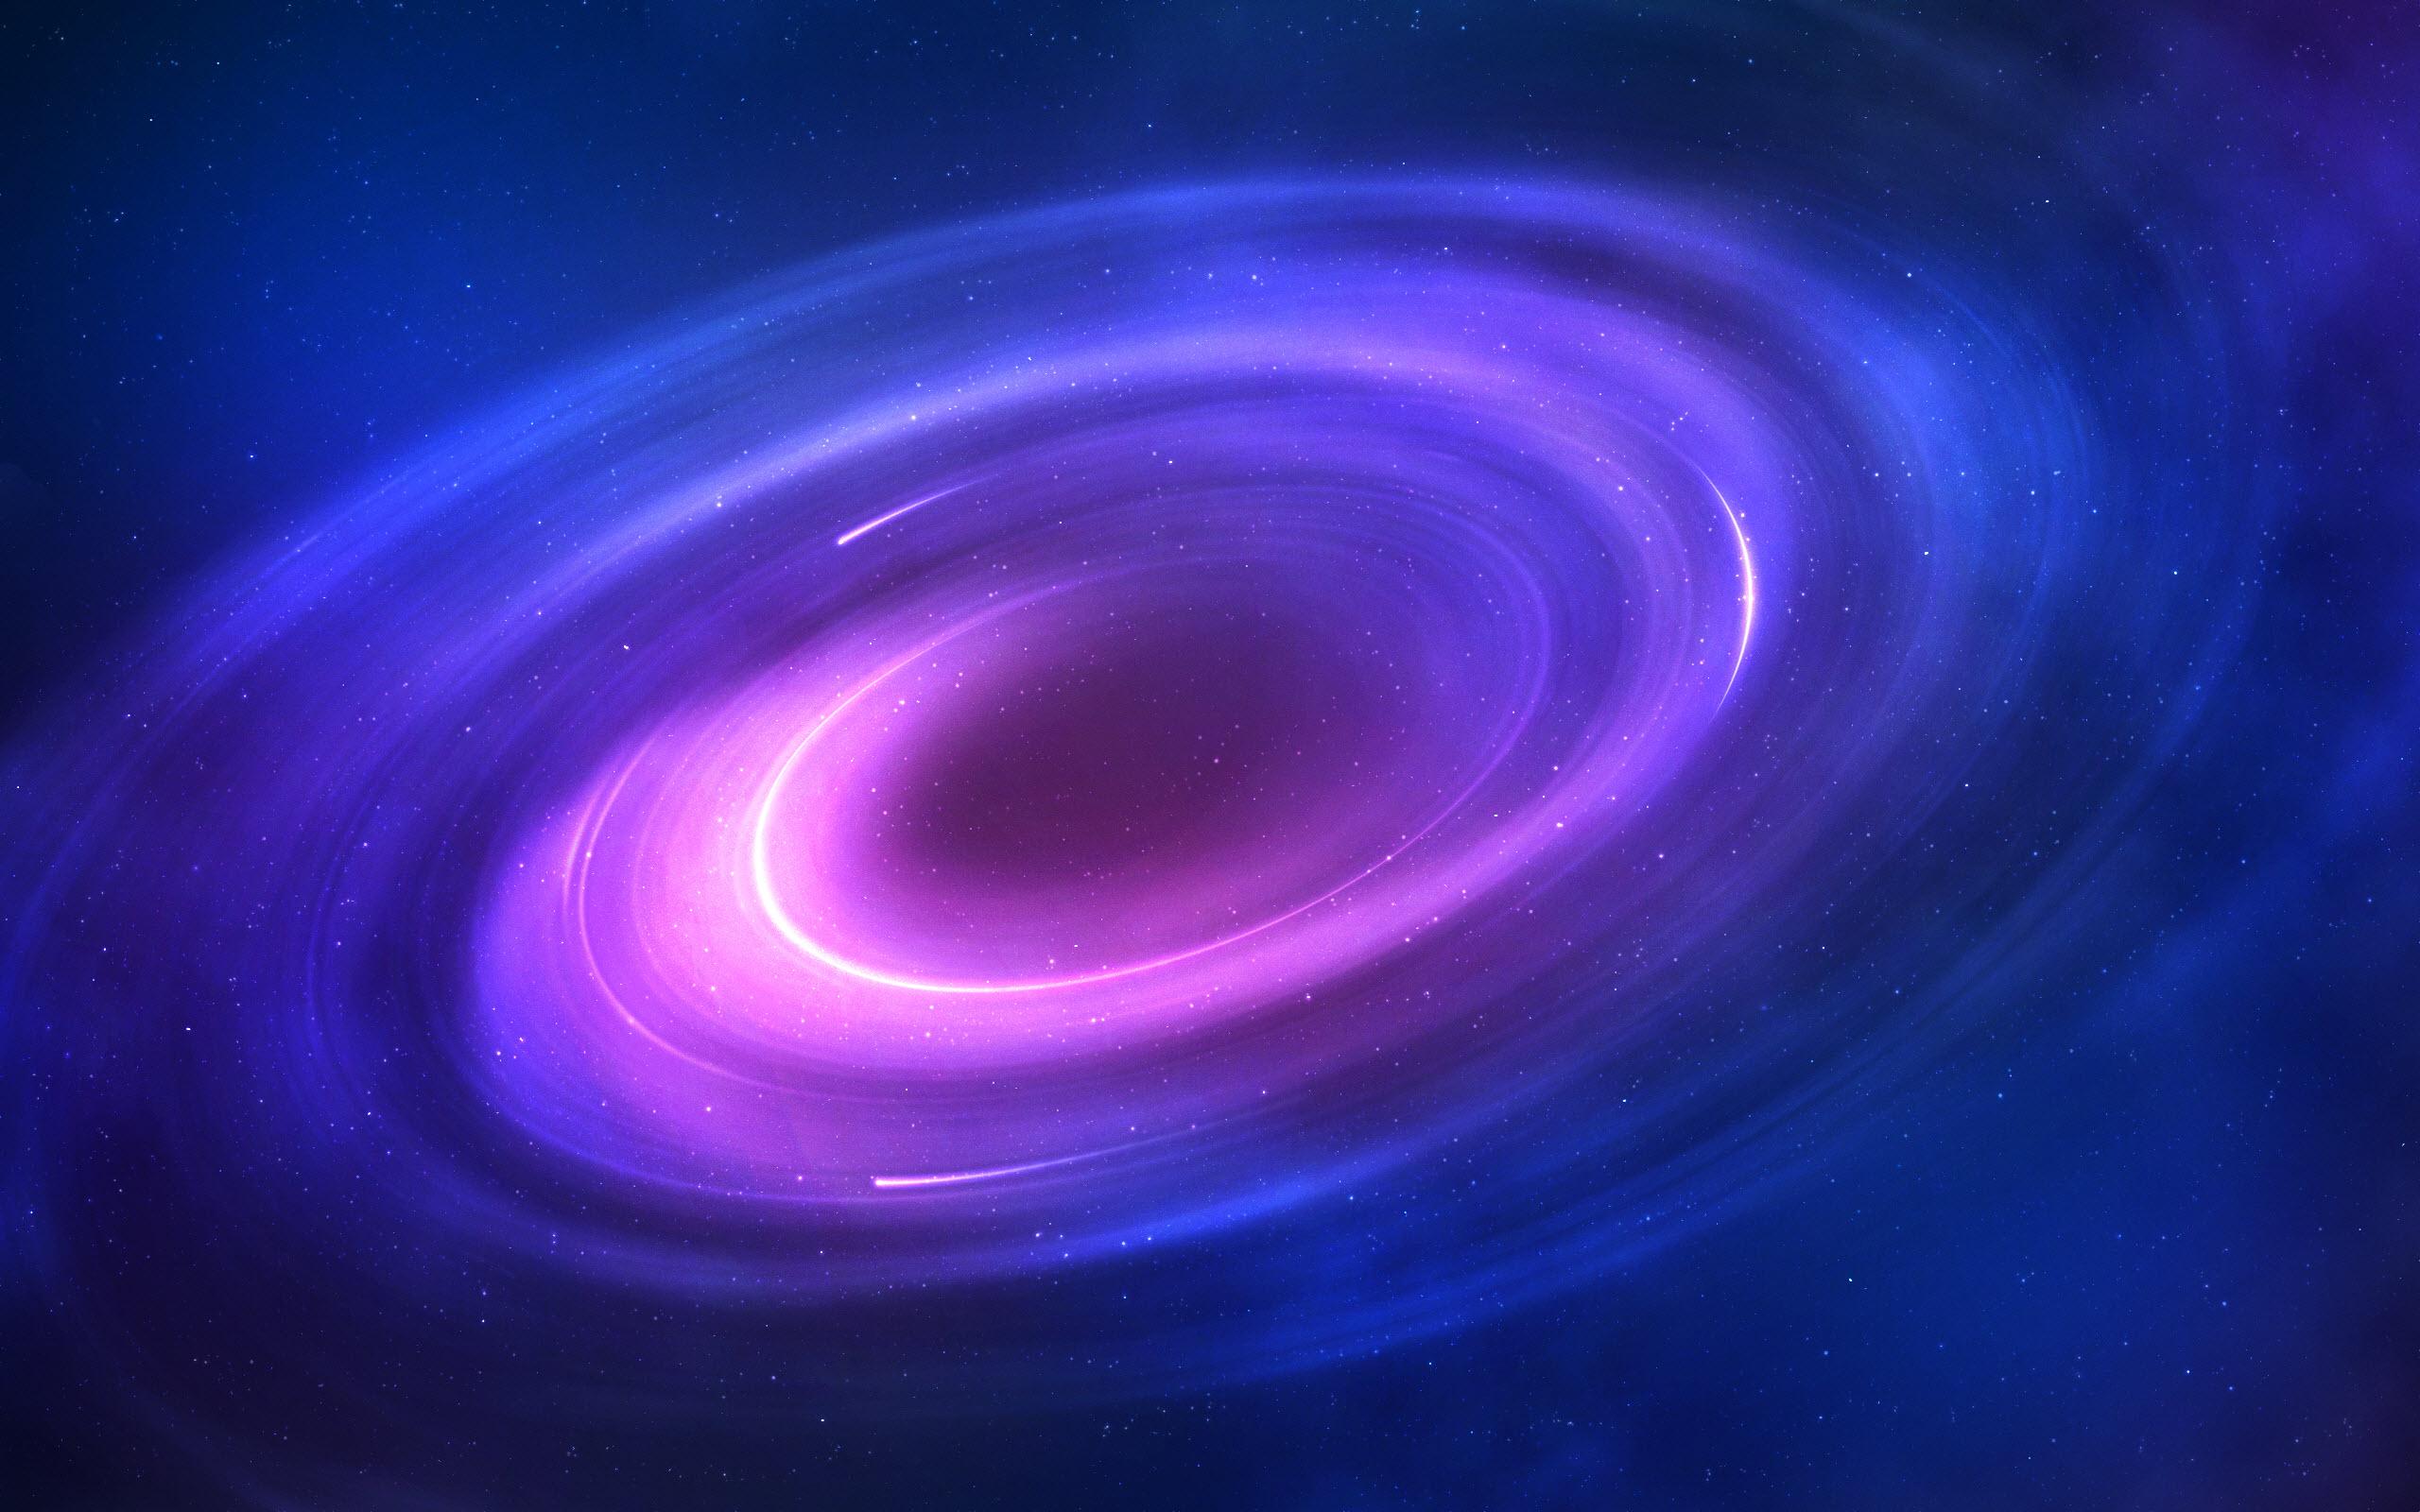 44 hd purple space wallpaper on wallpapersafari - 1080p nebula wallpaper ...